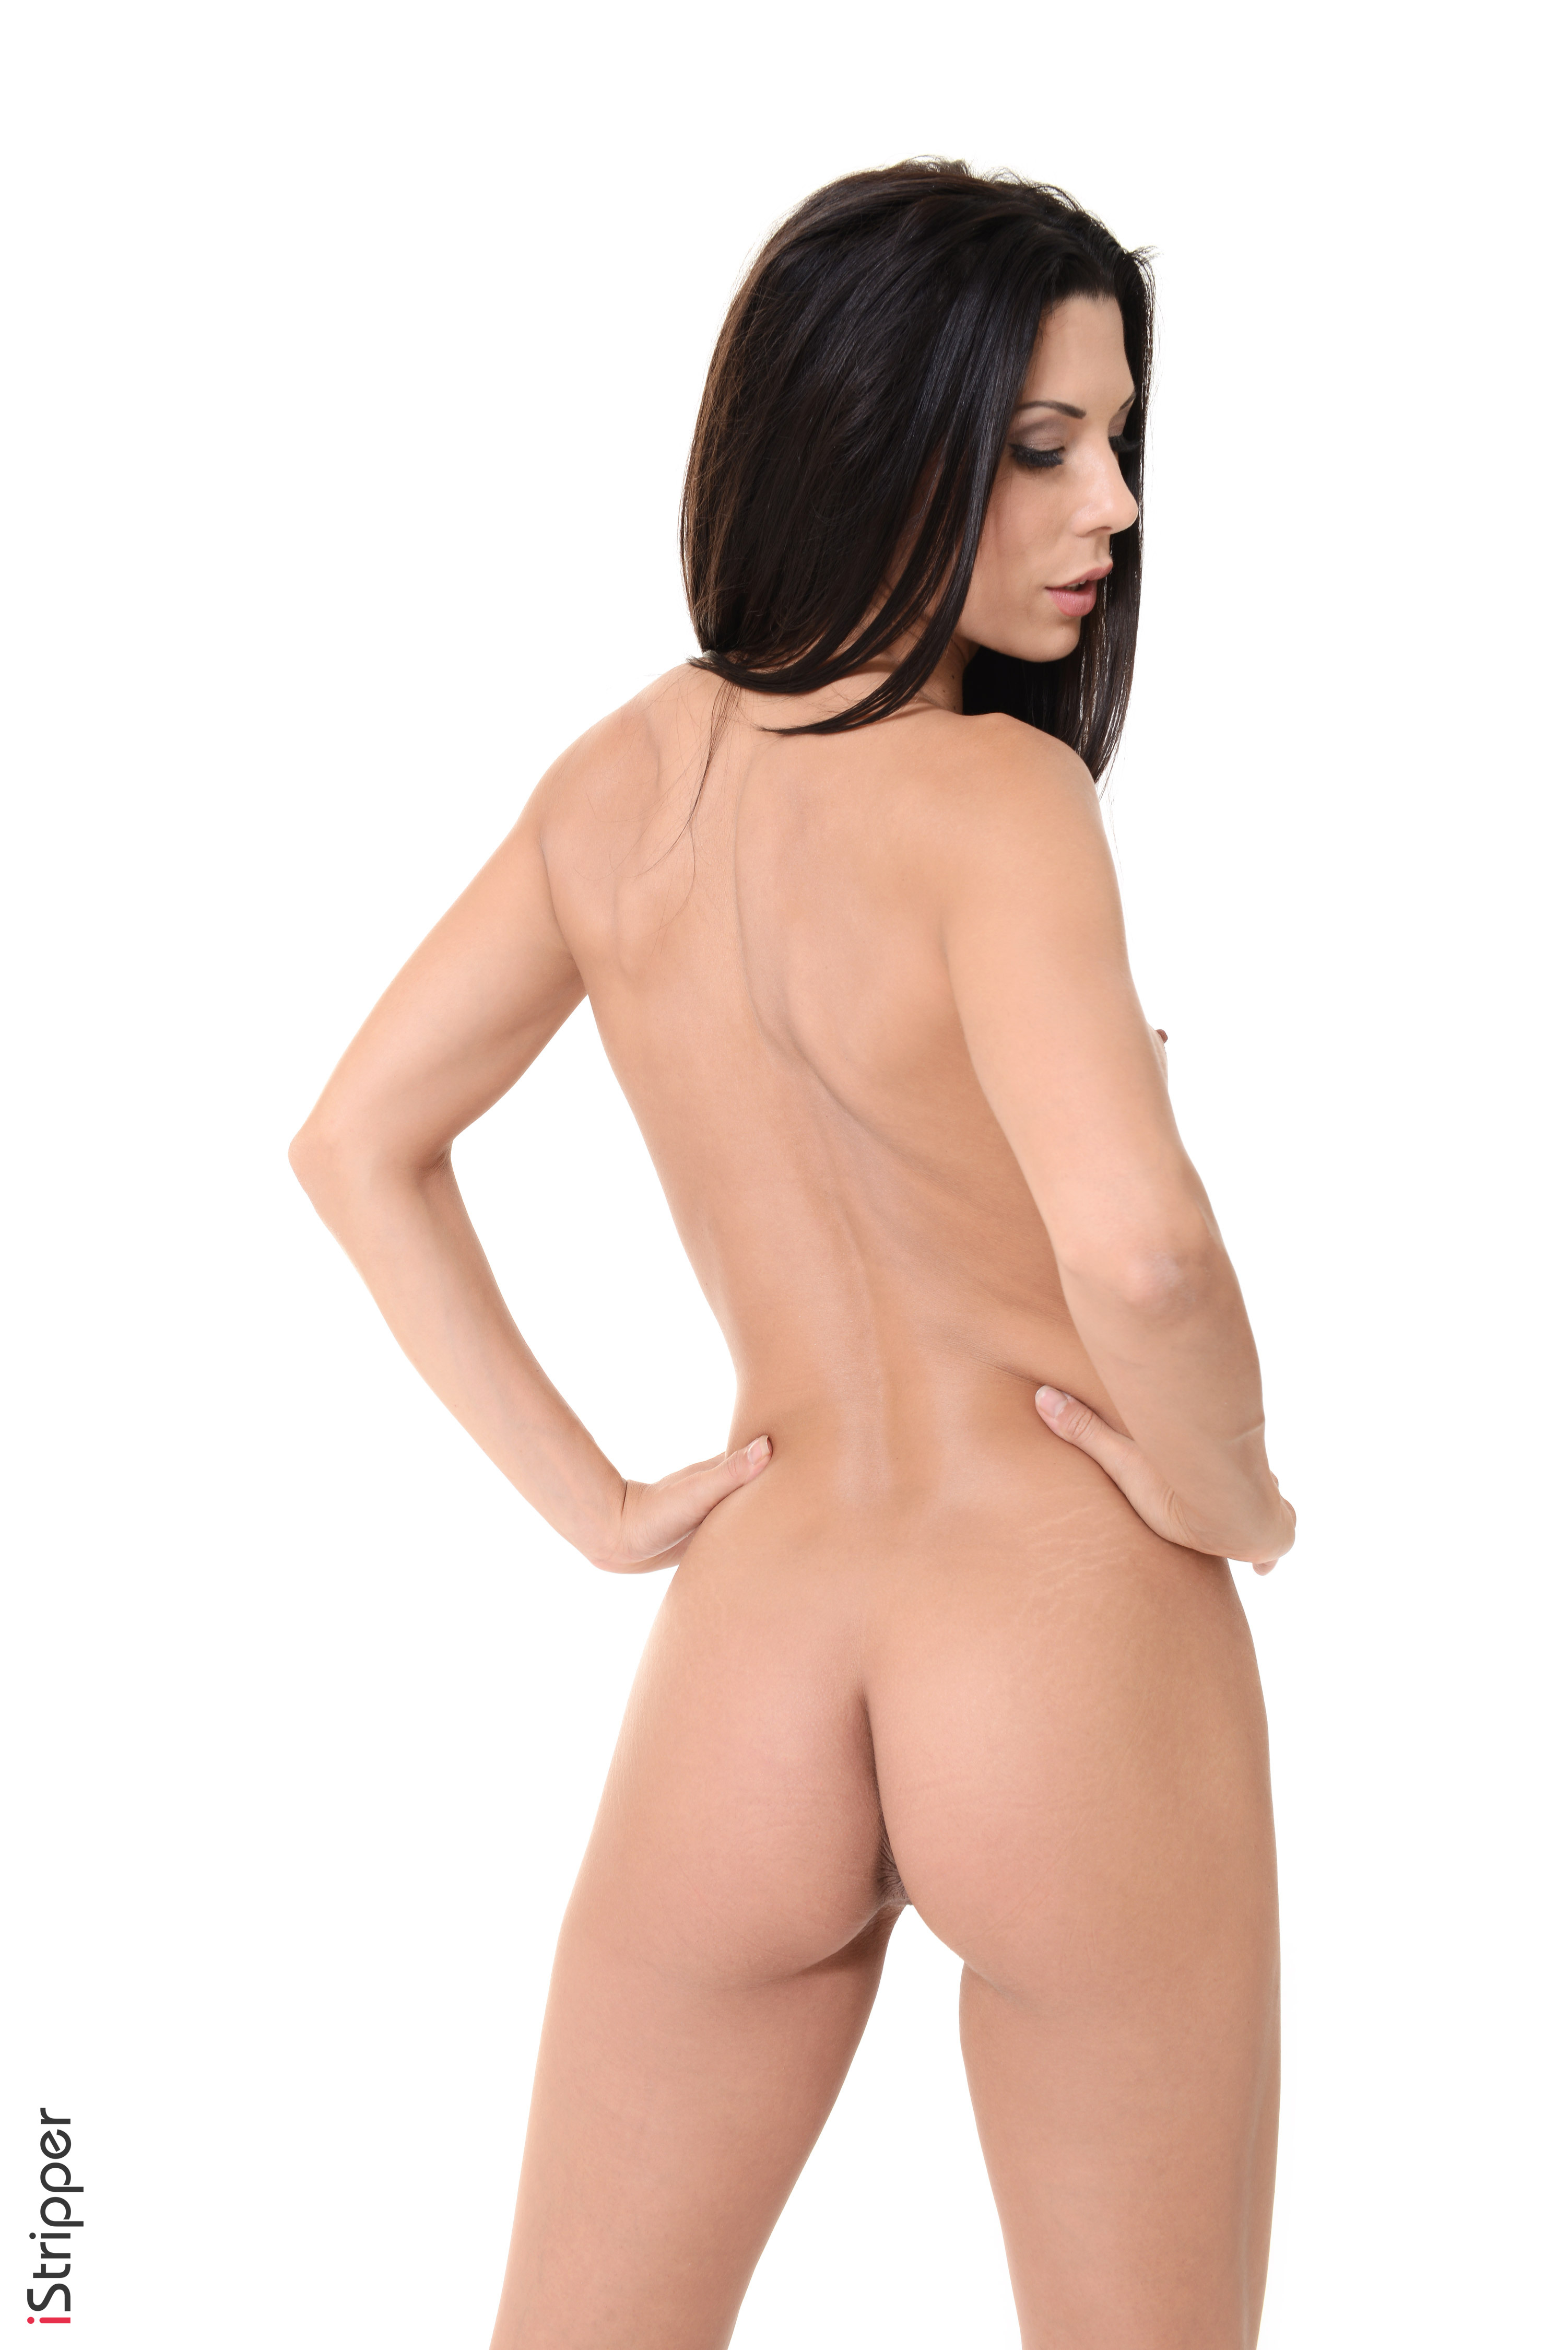 nude girl wallpaper